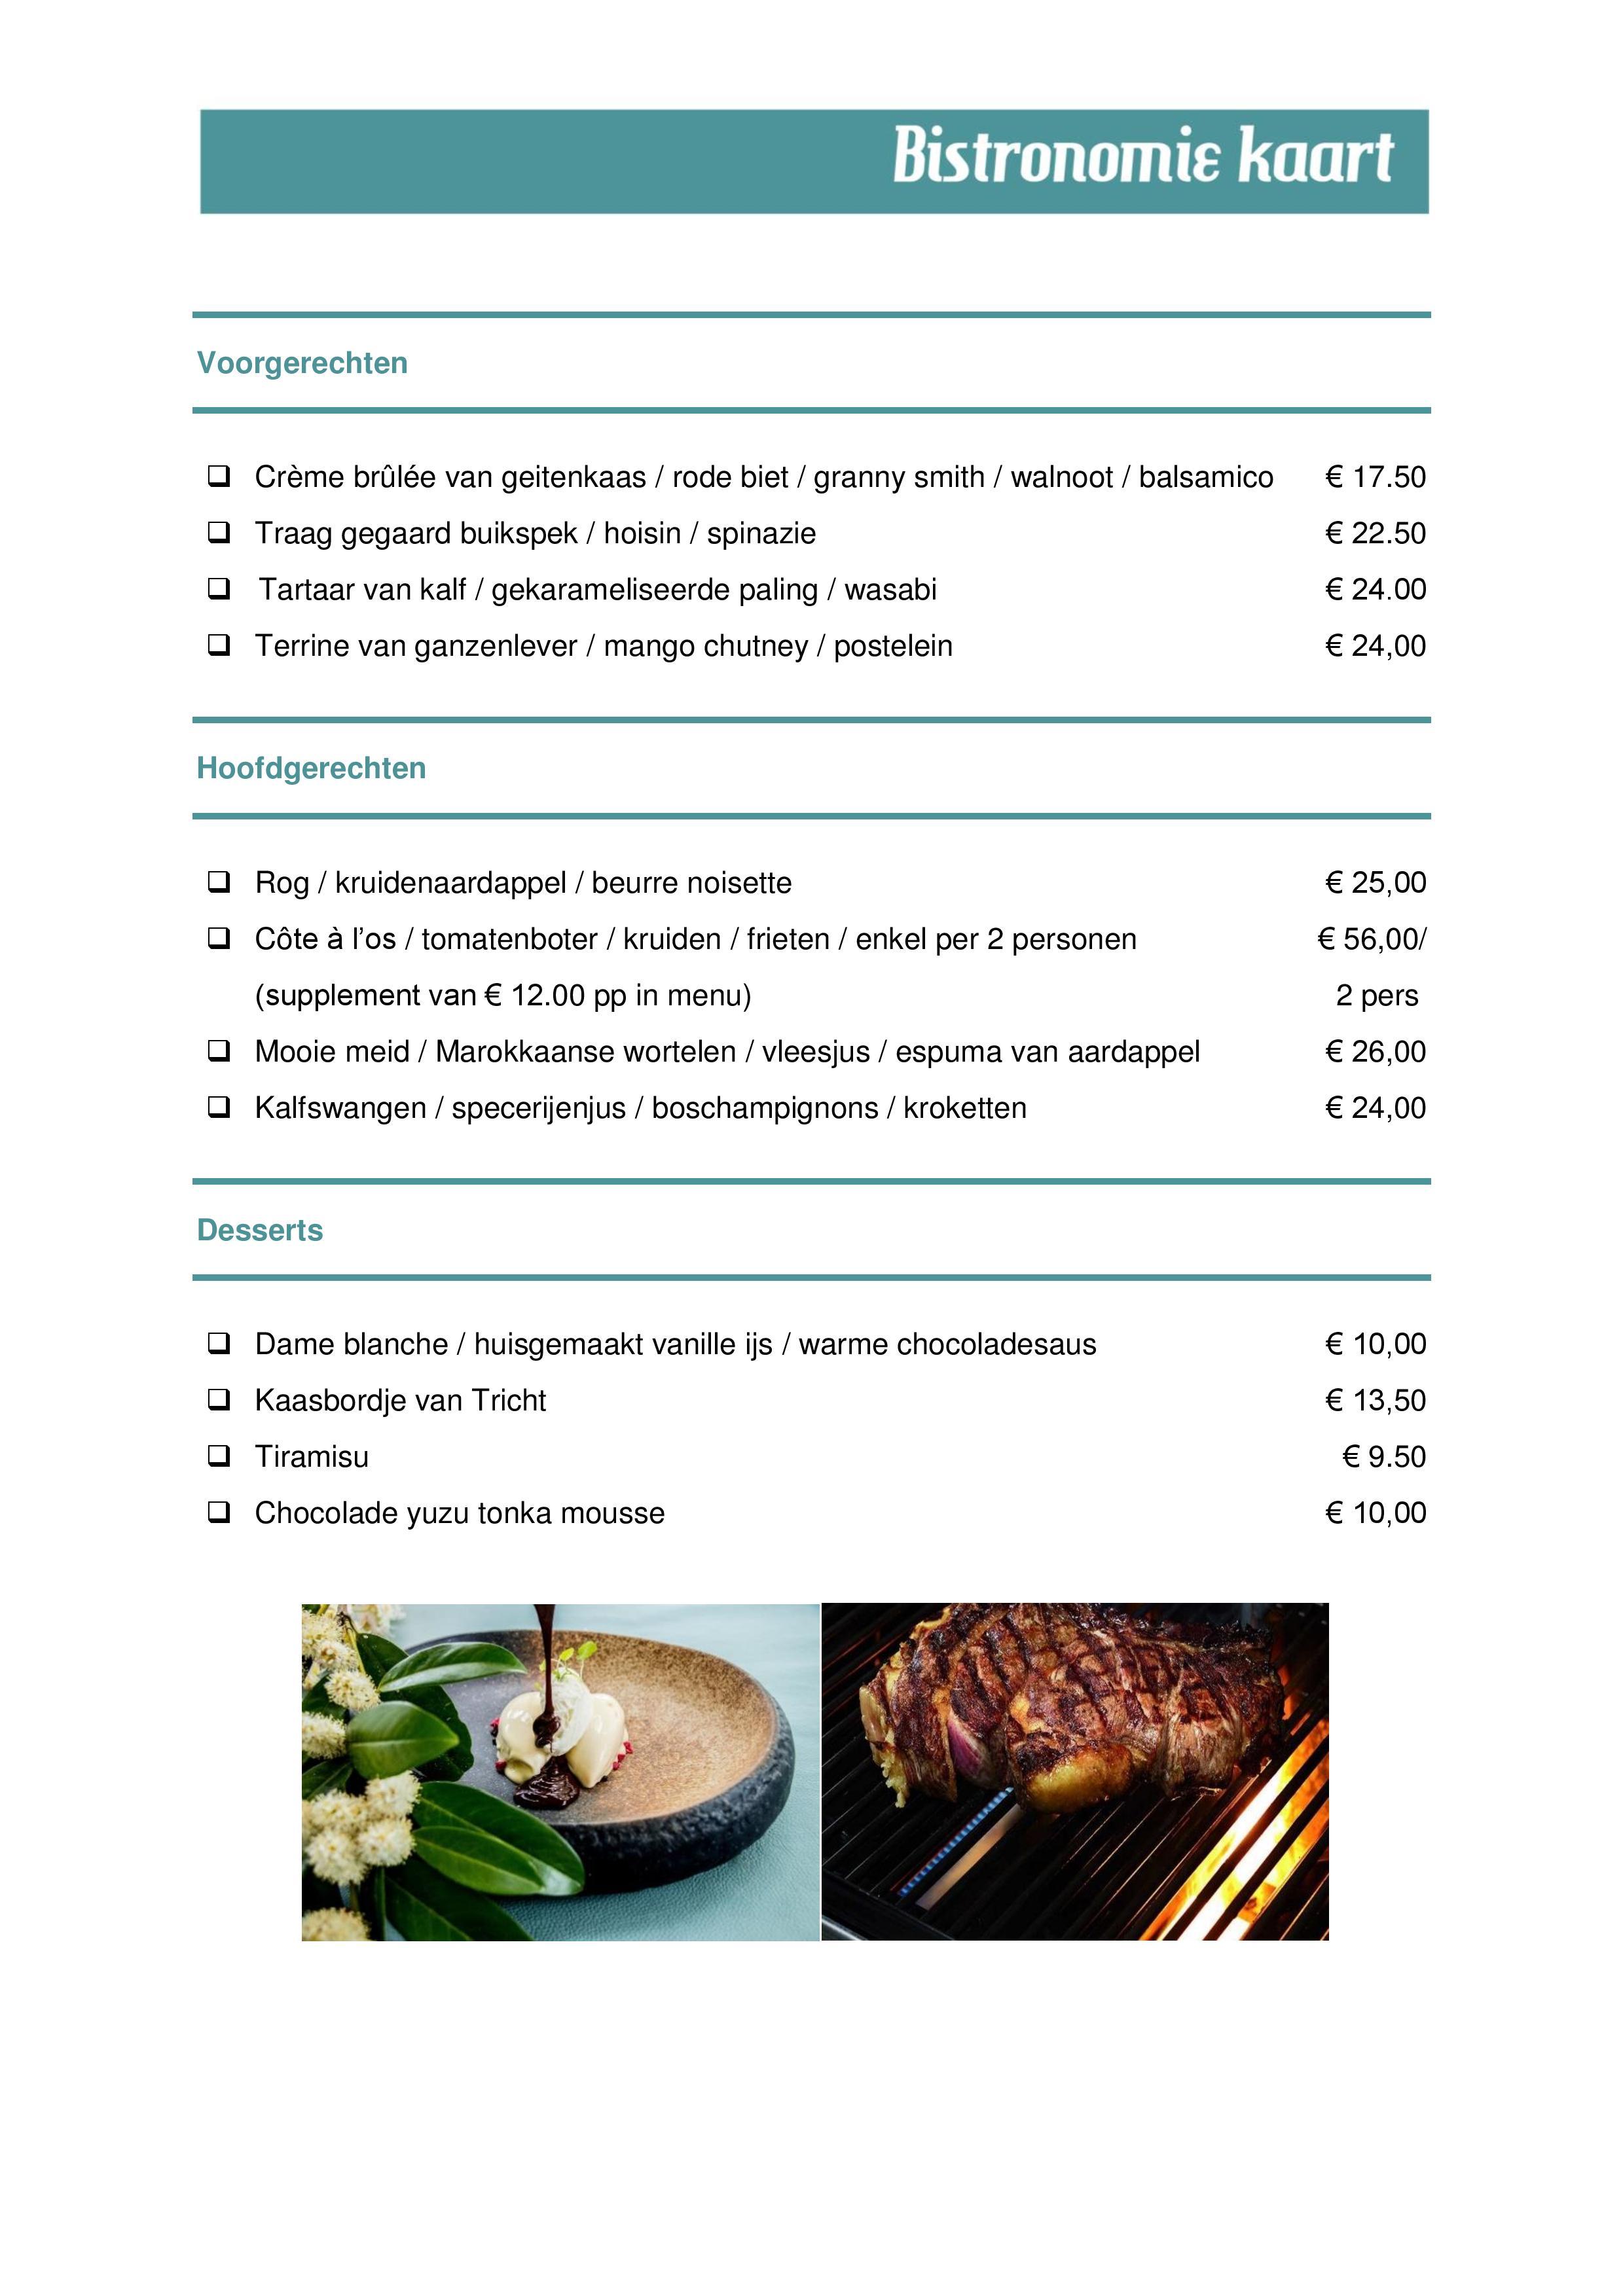 Plaasj Kaffee Food & Drinks Bistronomie